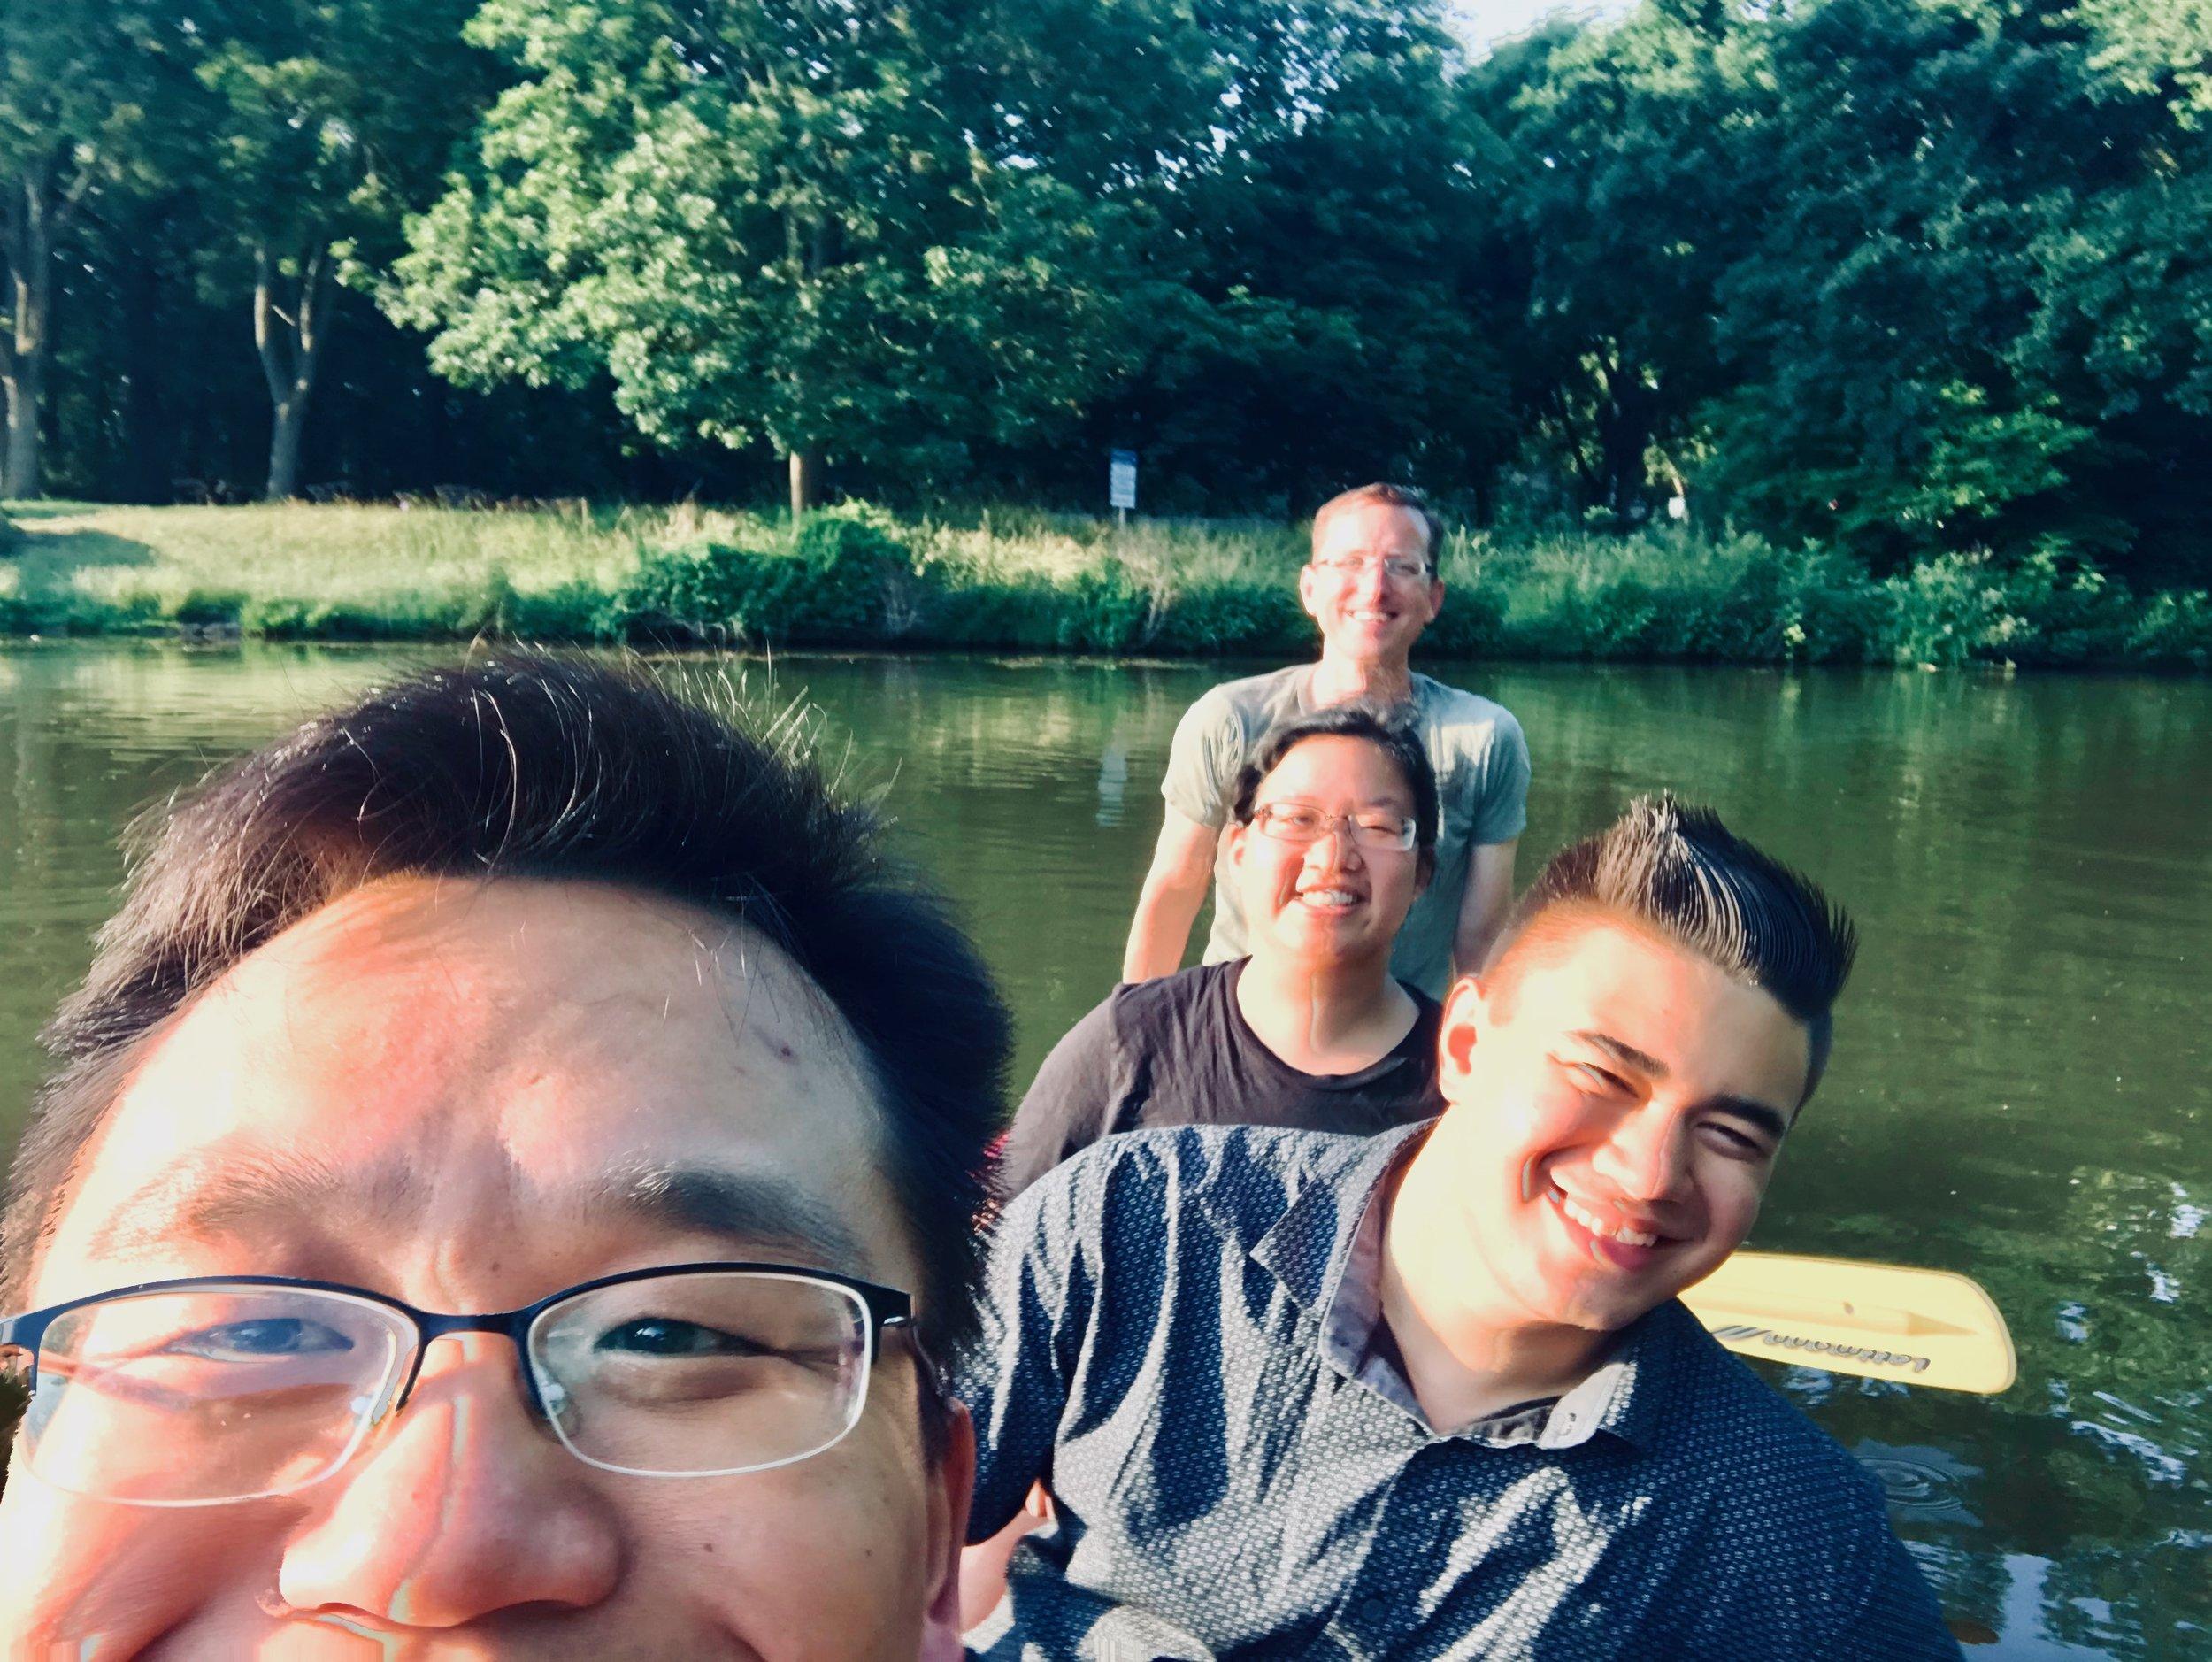 Cho, Alex, Jennifer, and Chris enjoy an evening canoe trip in Leipzig.